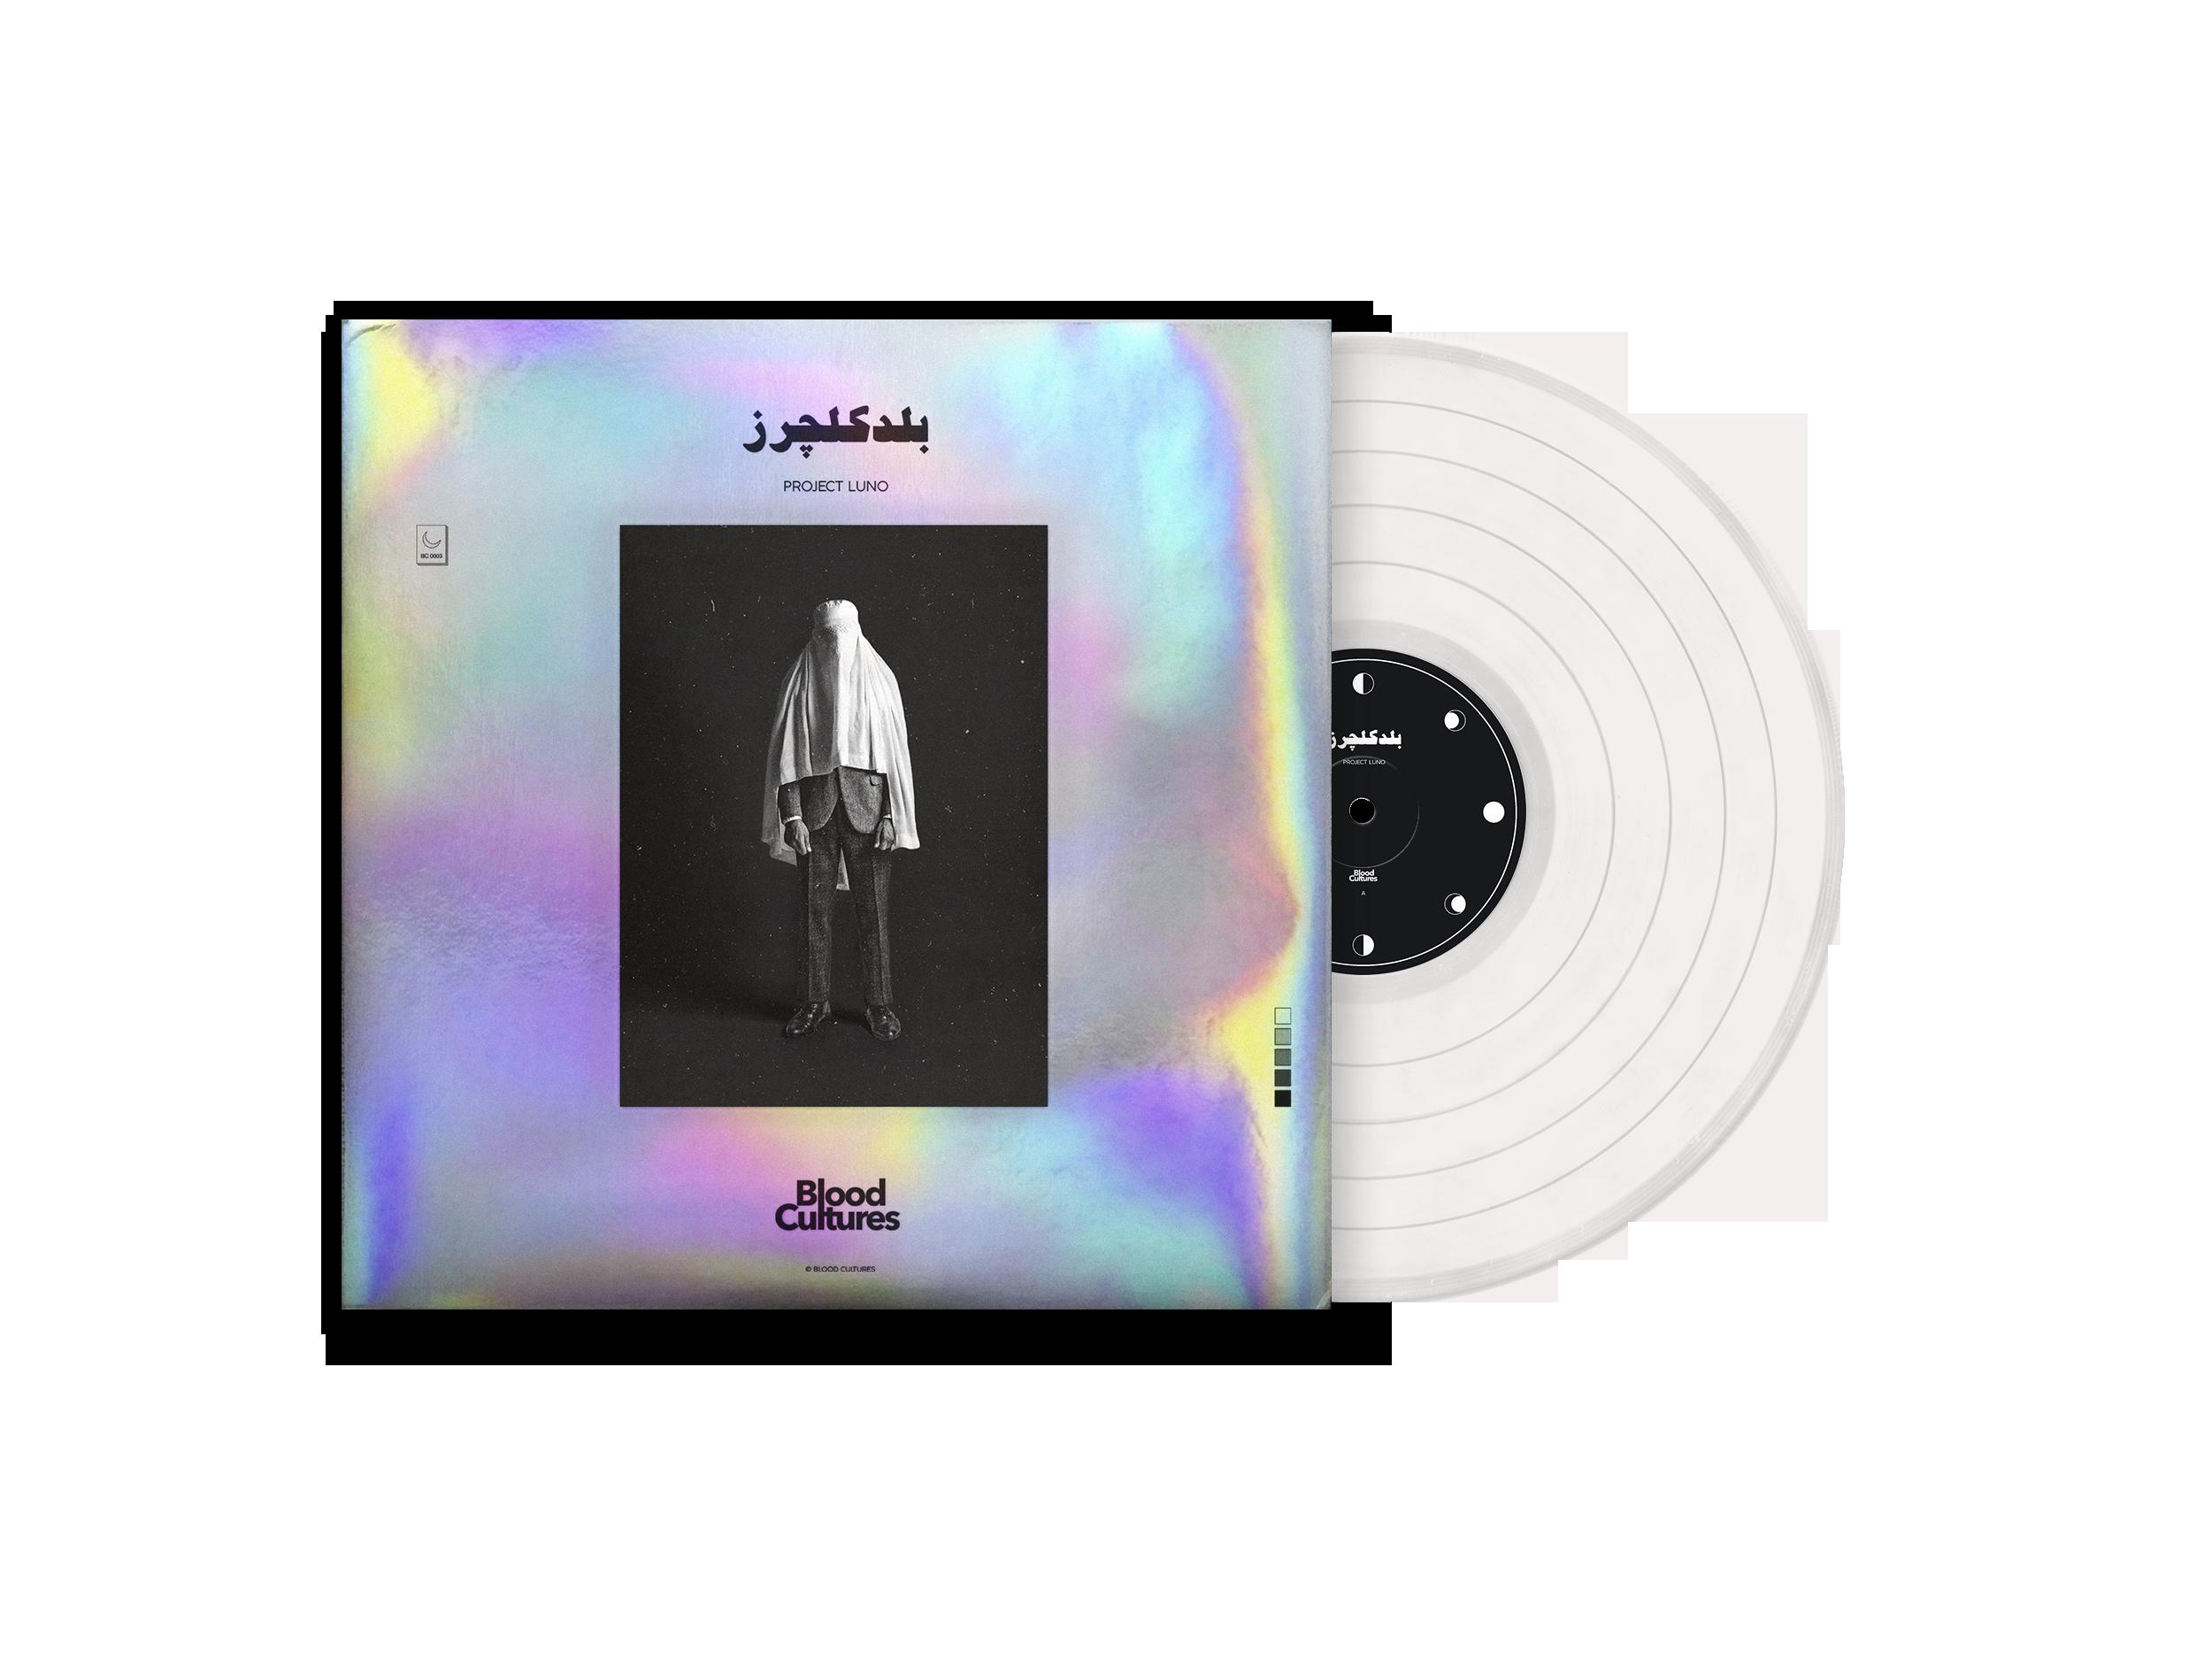 LUNO - Holographic Limited Vinyl [Pre-Order]